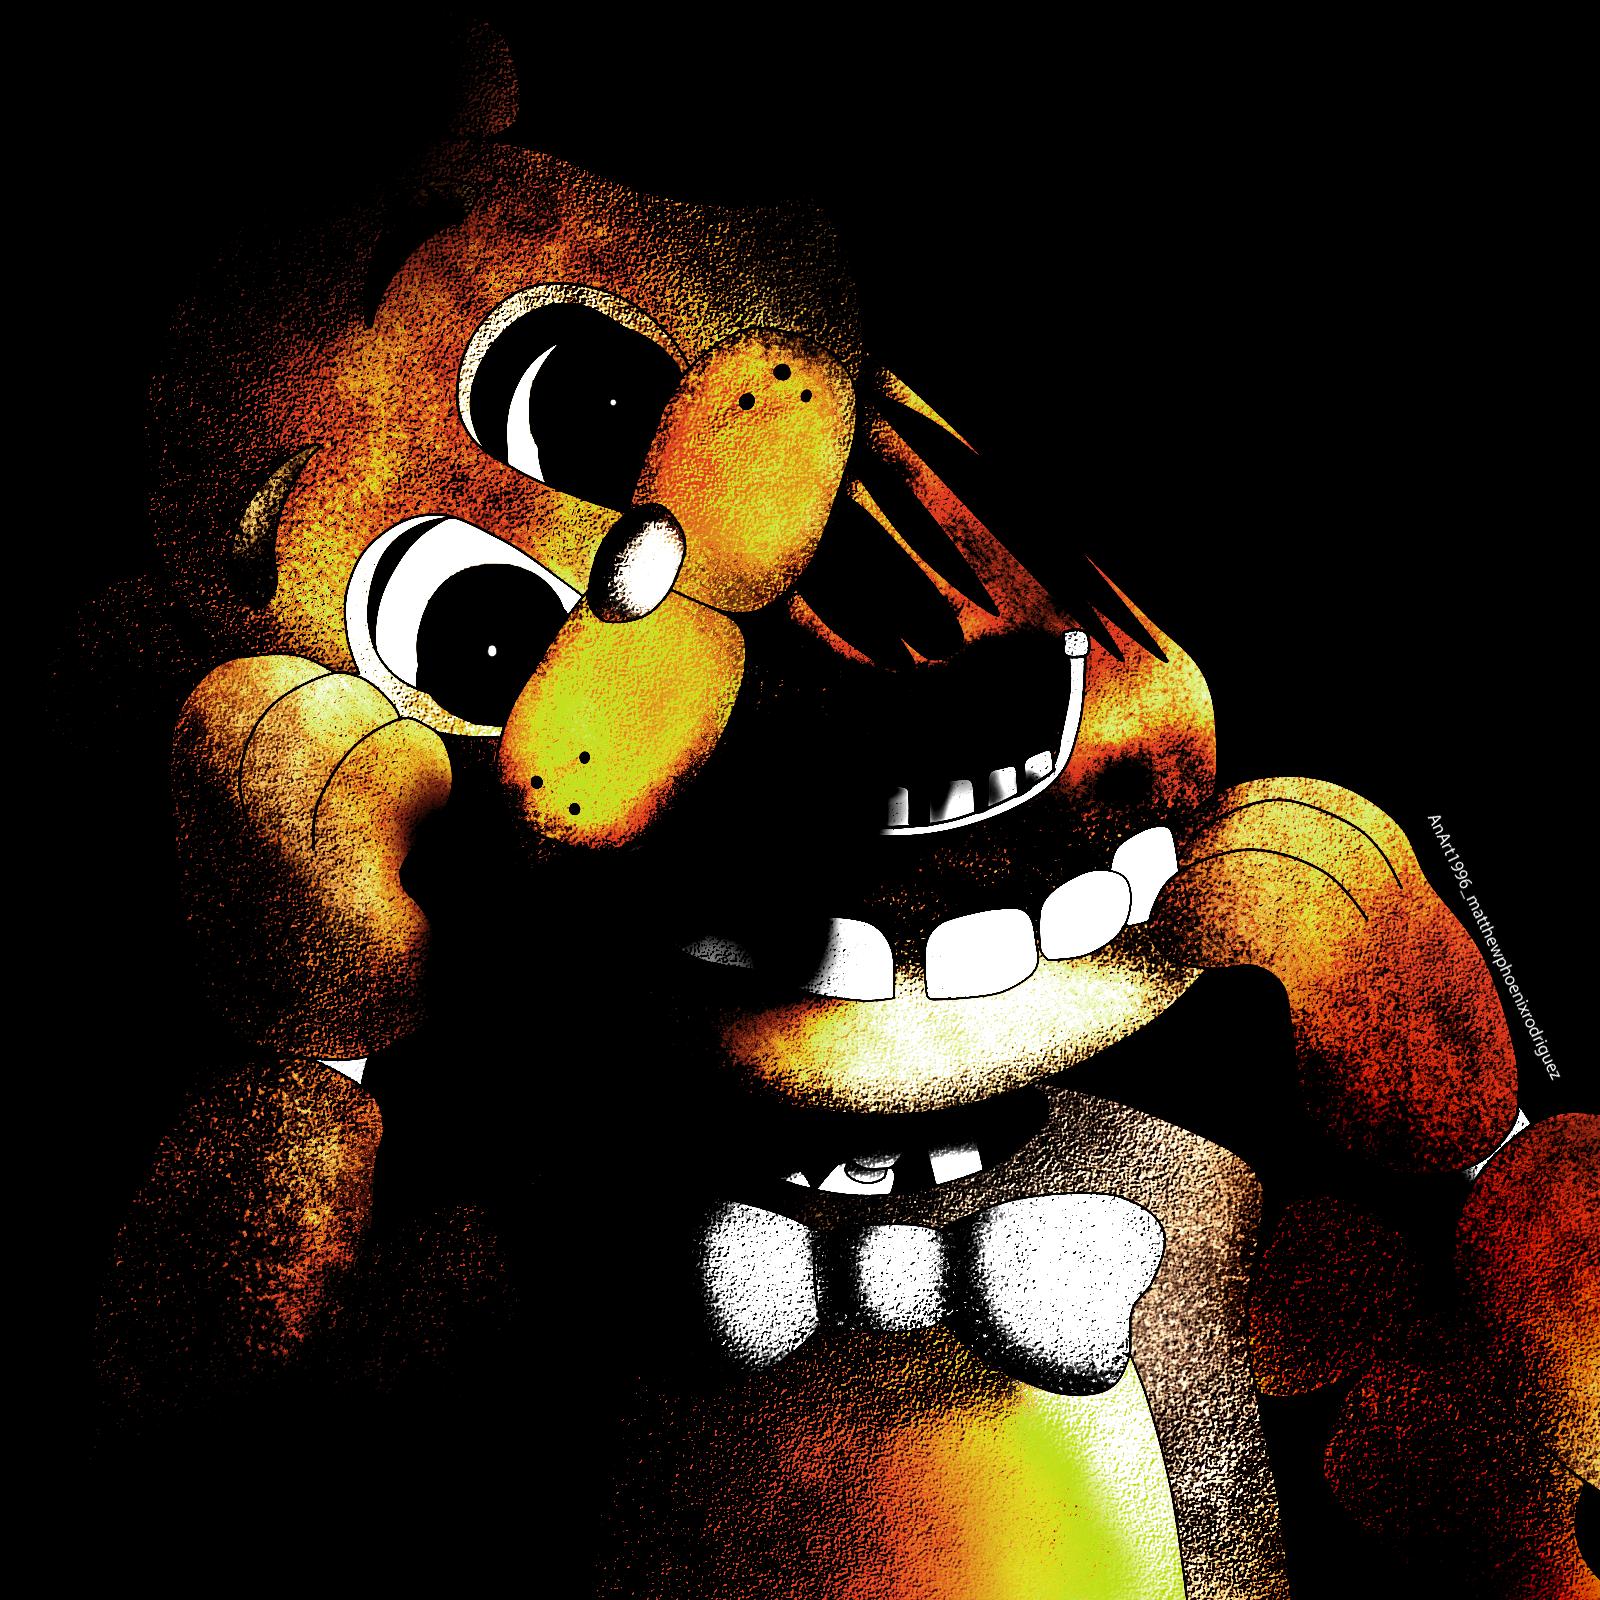 Freddy by anart1996 on deviantart